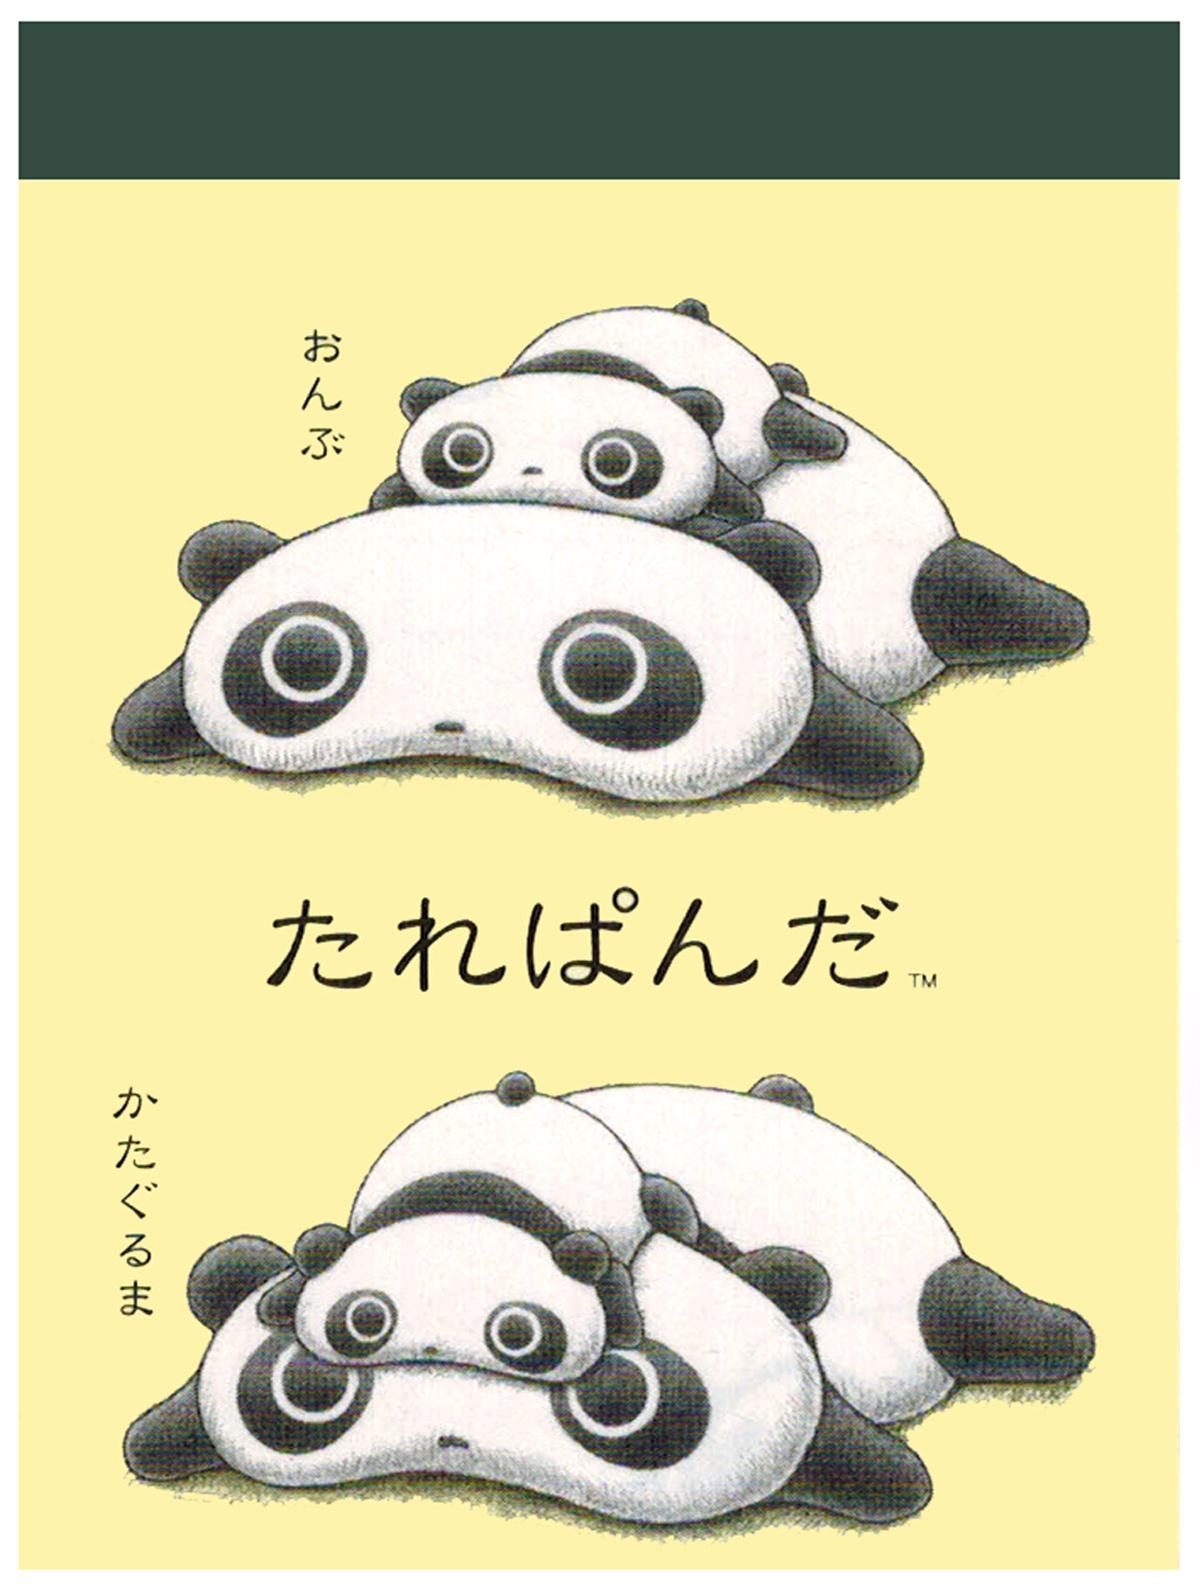 San-x-Tare-Panda-Anniversary-Mini-Memo-Pad-Yellow-wallpaper-wp44011088